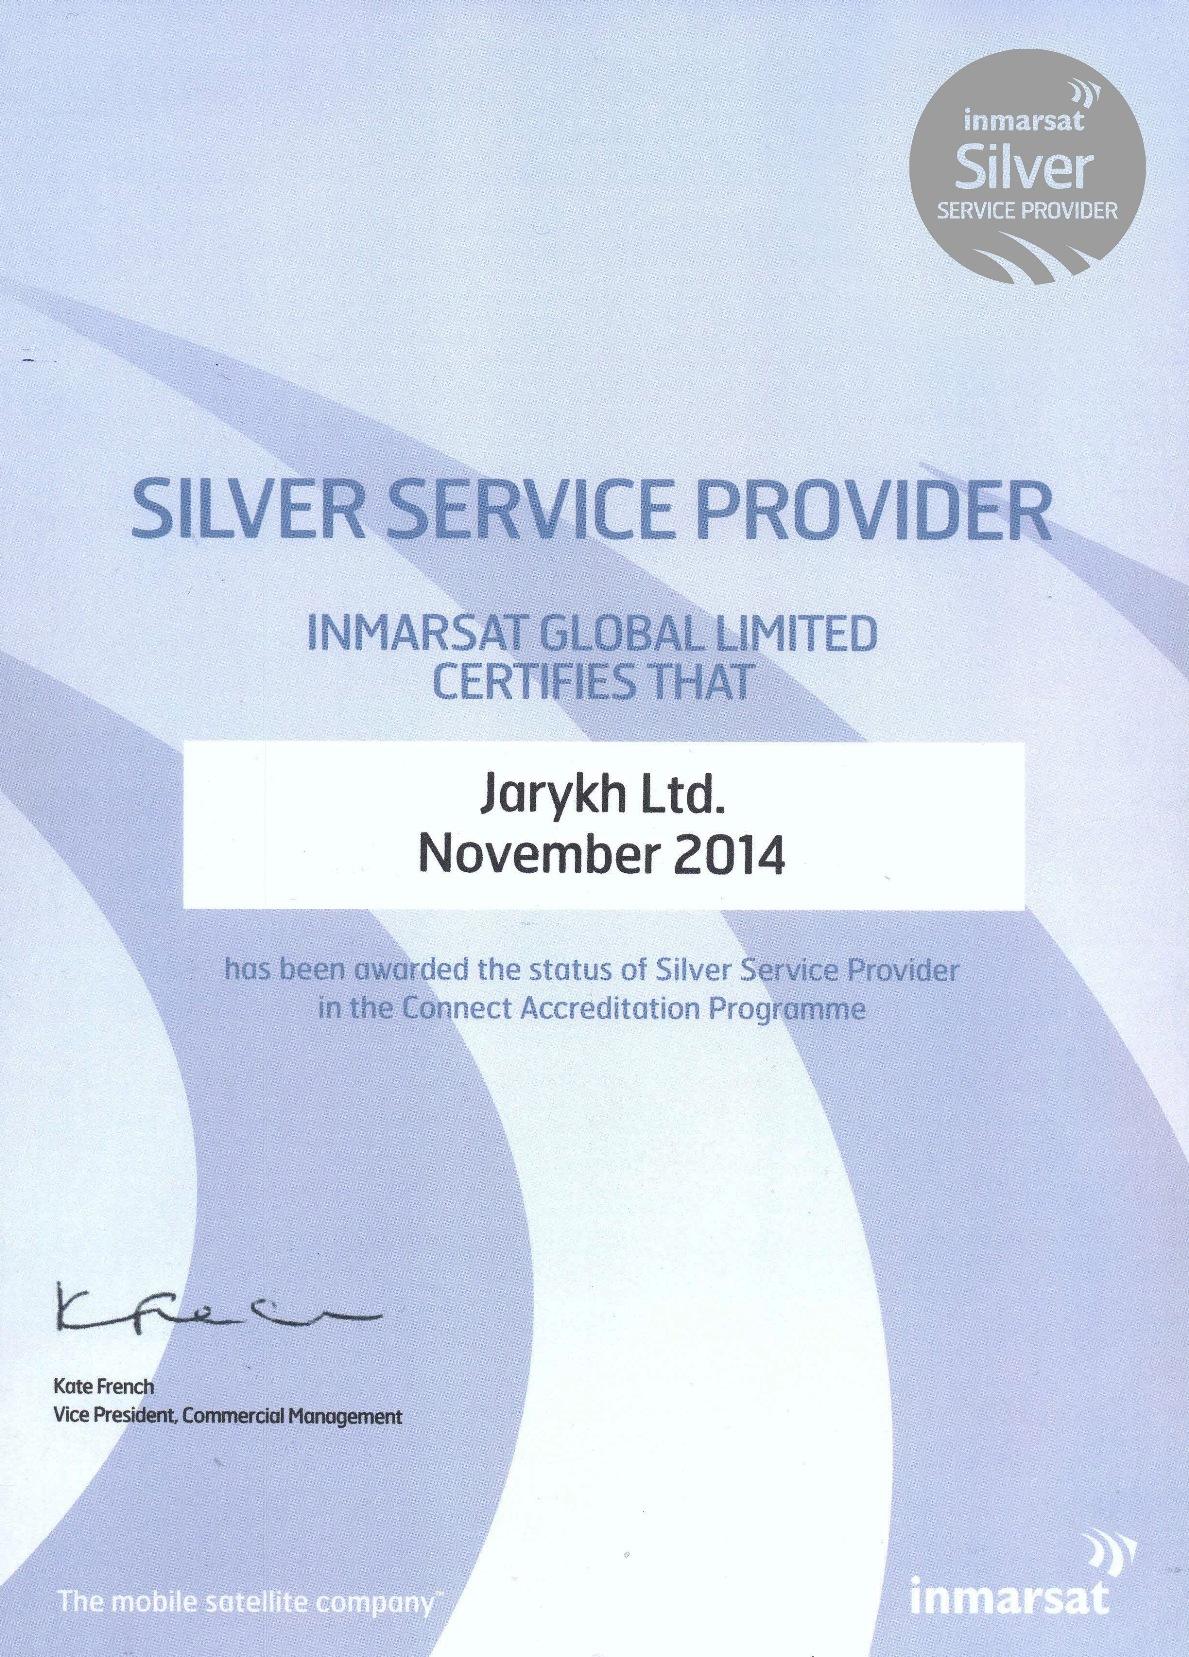 SILVER_service_provi.jpg